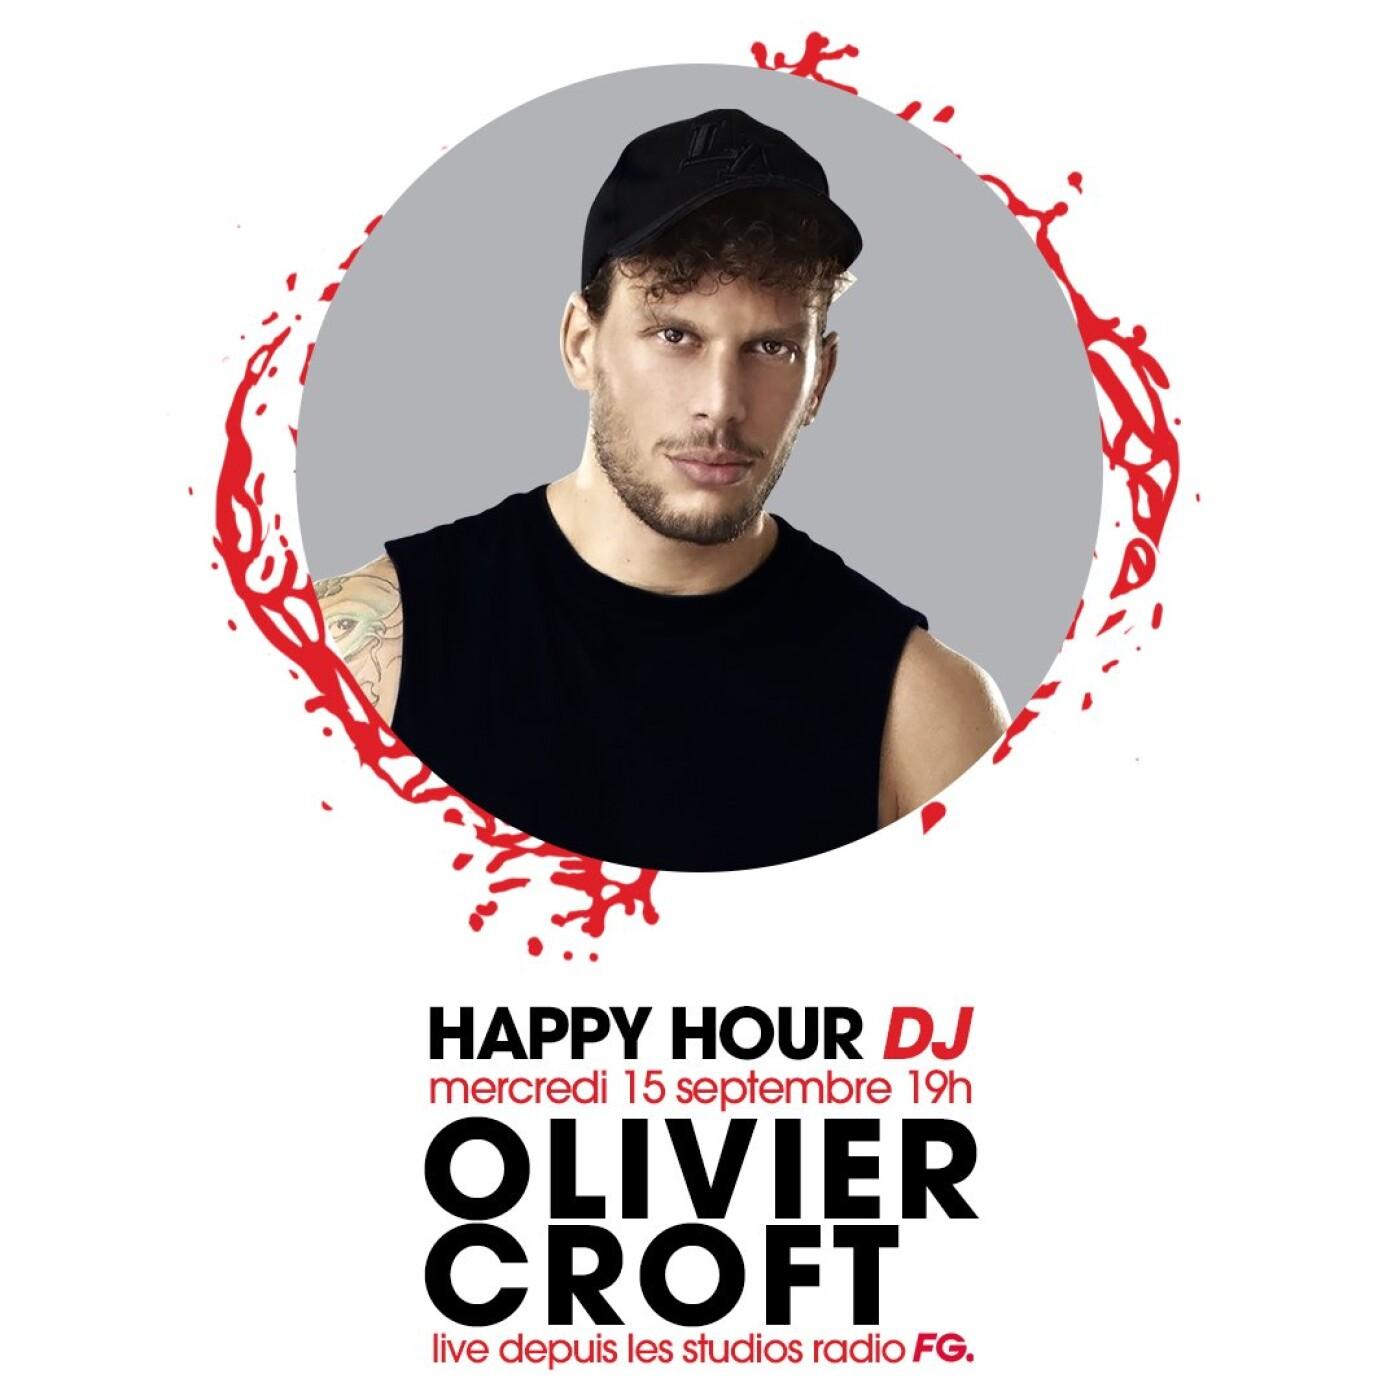 HAPPY HOUR DJ : OLIVIER CROFT